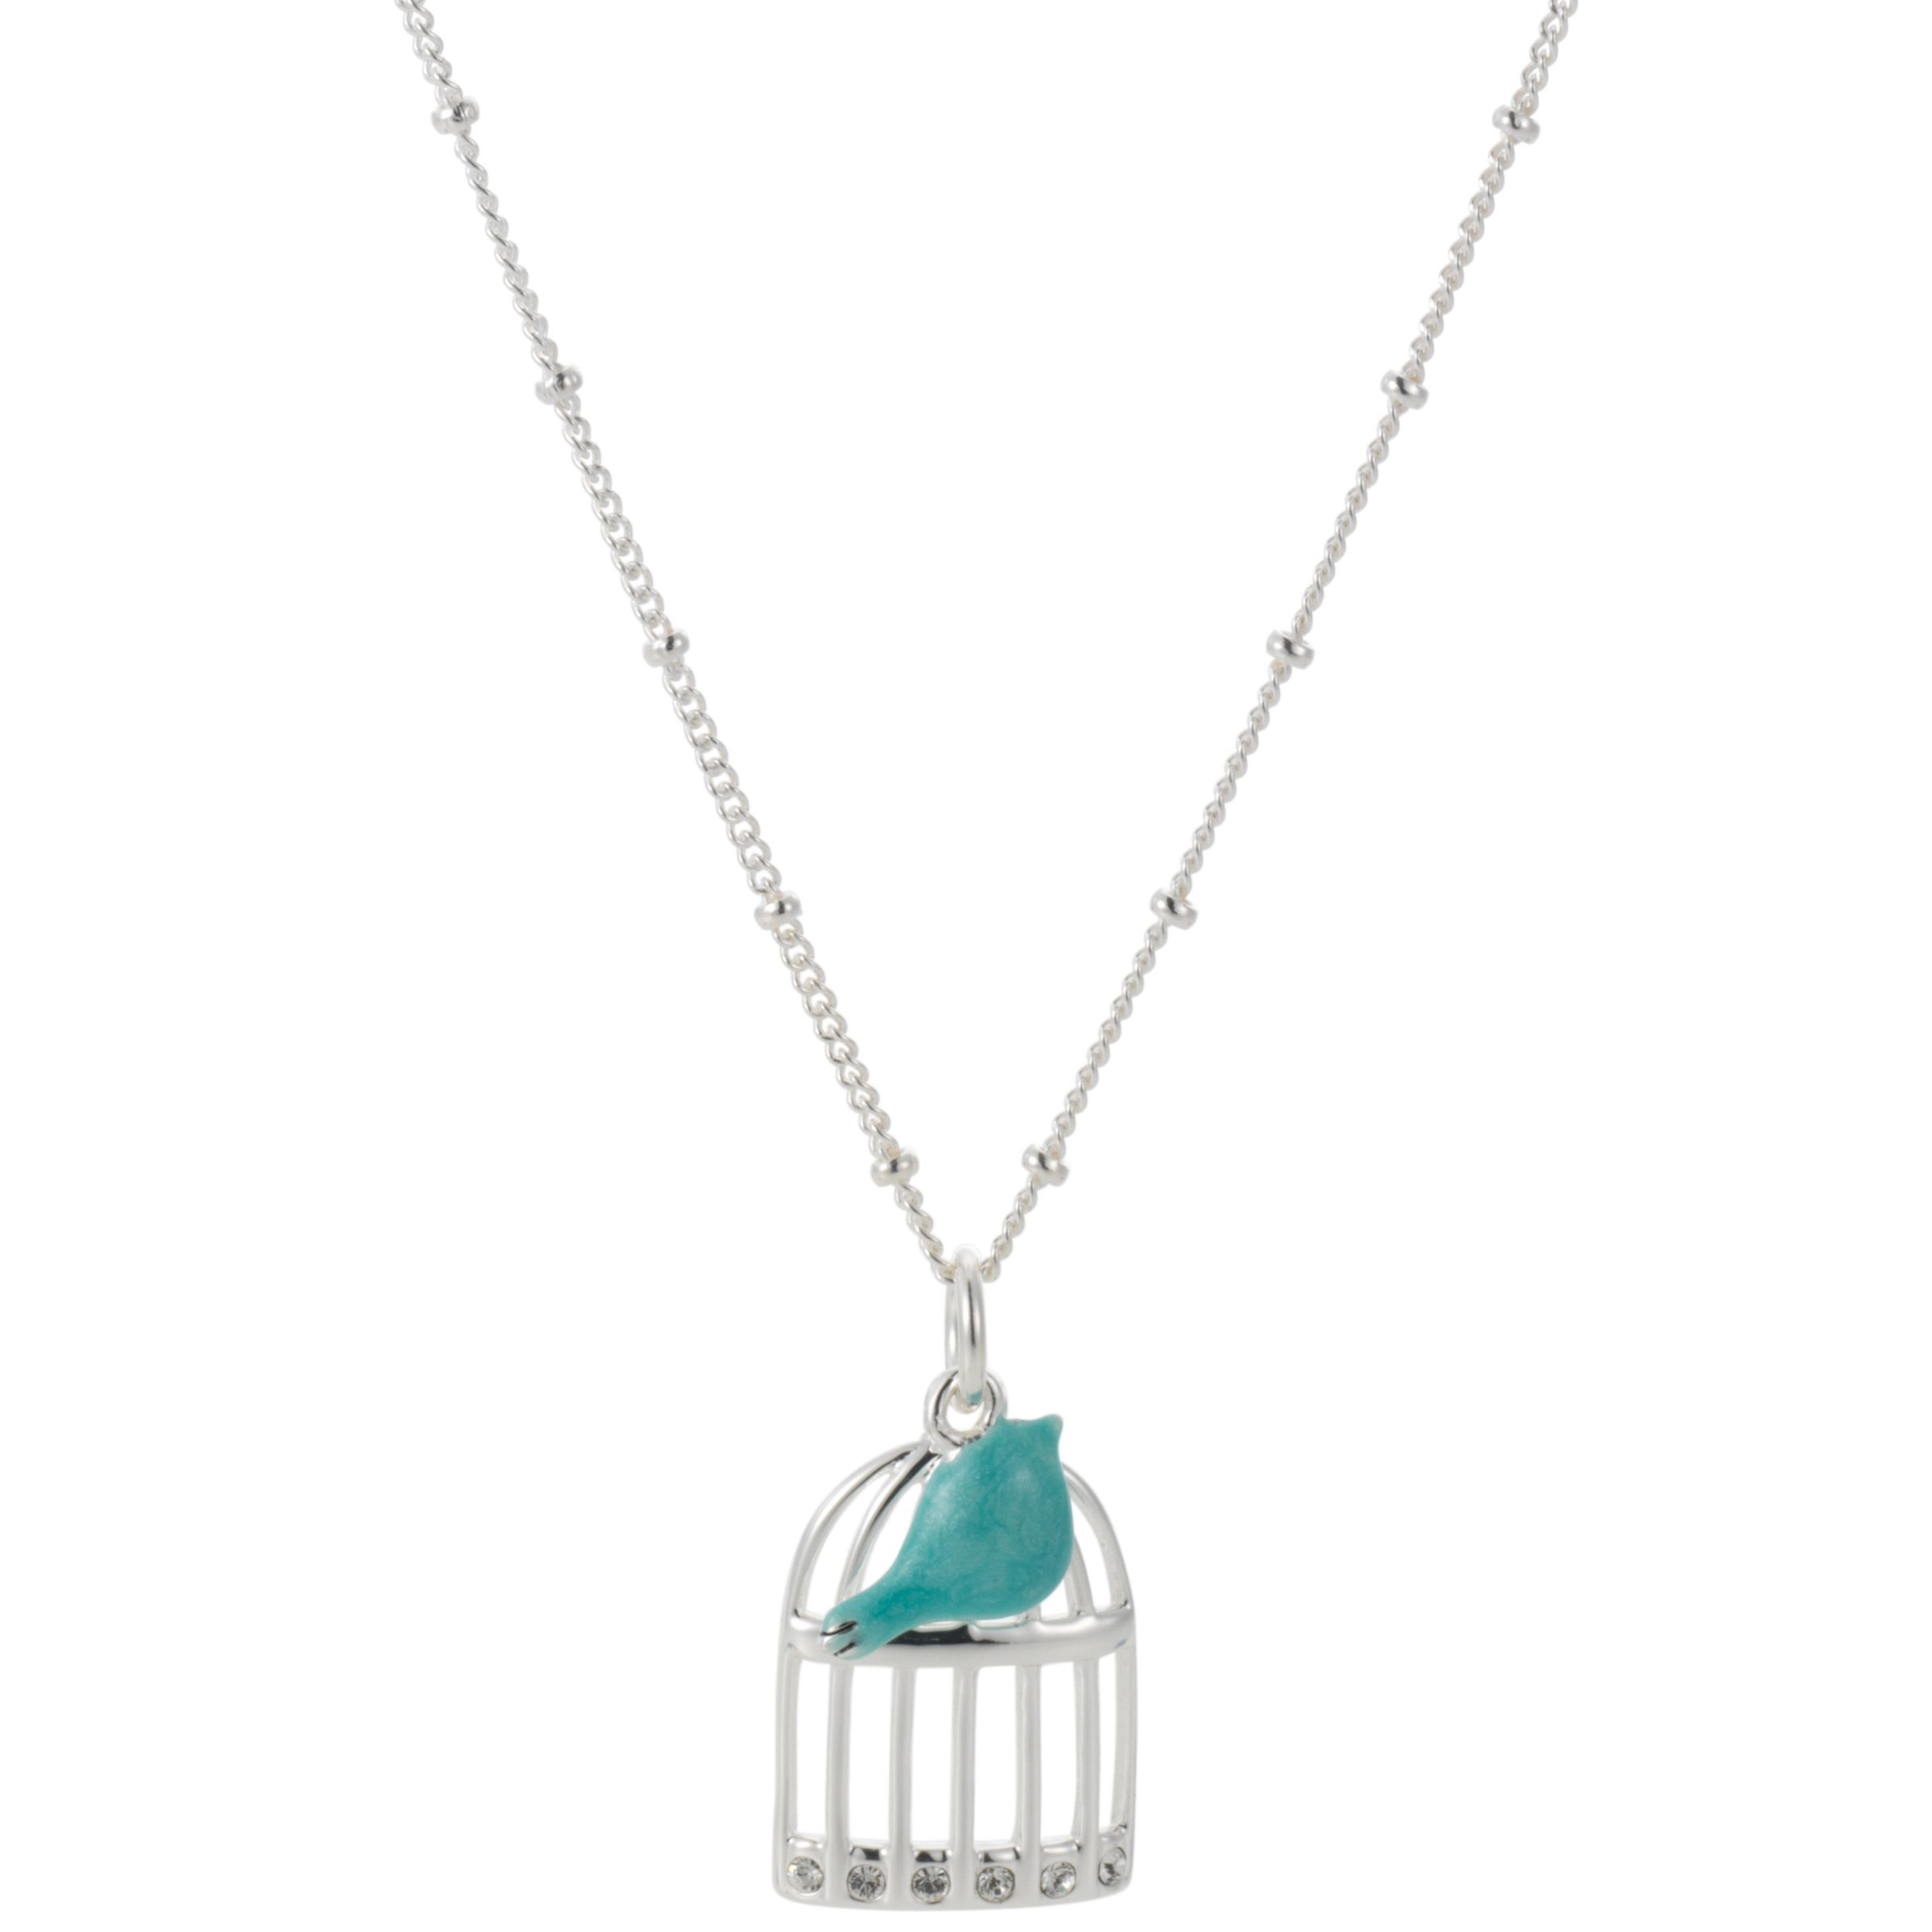 Martick Enamel Silver Birdcage Pendant Necklace